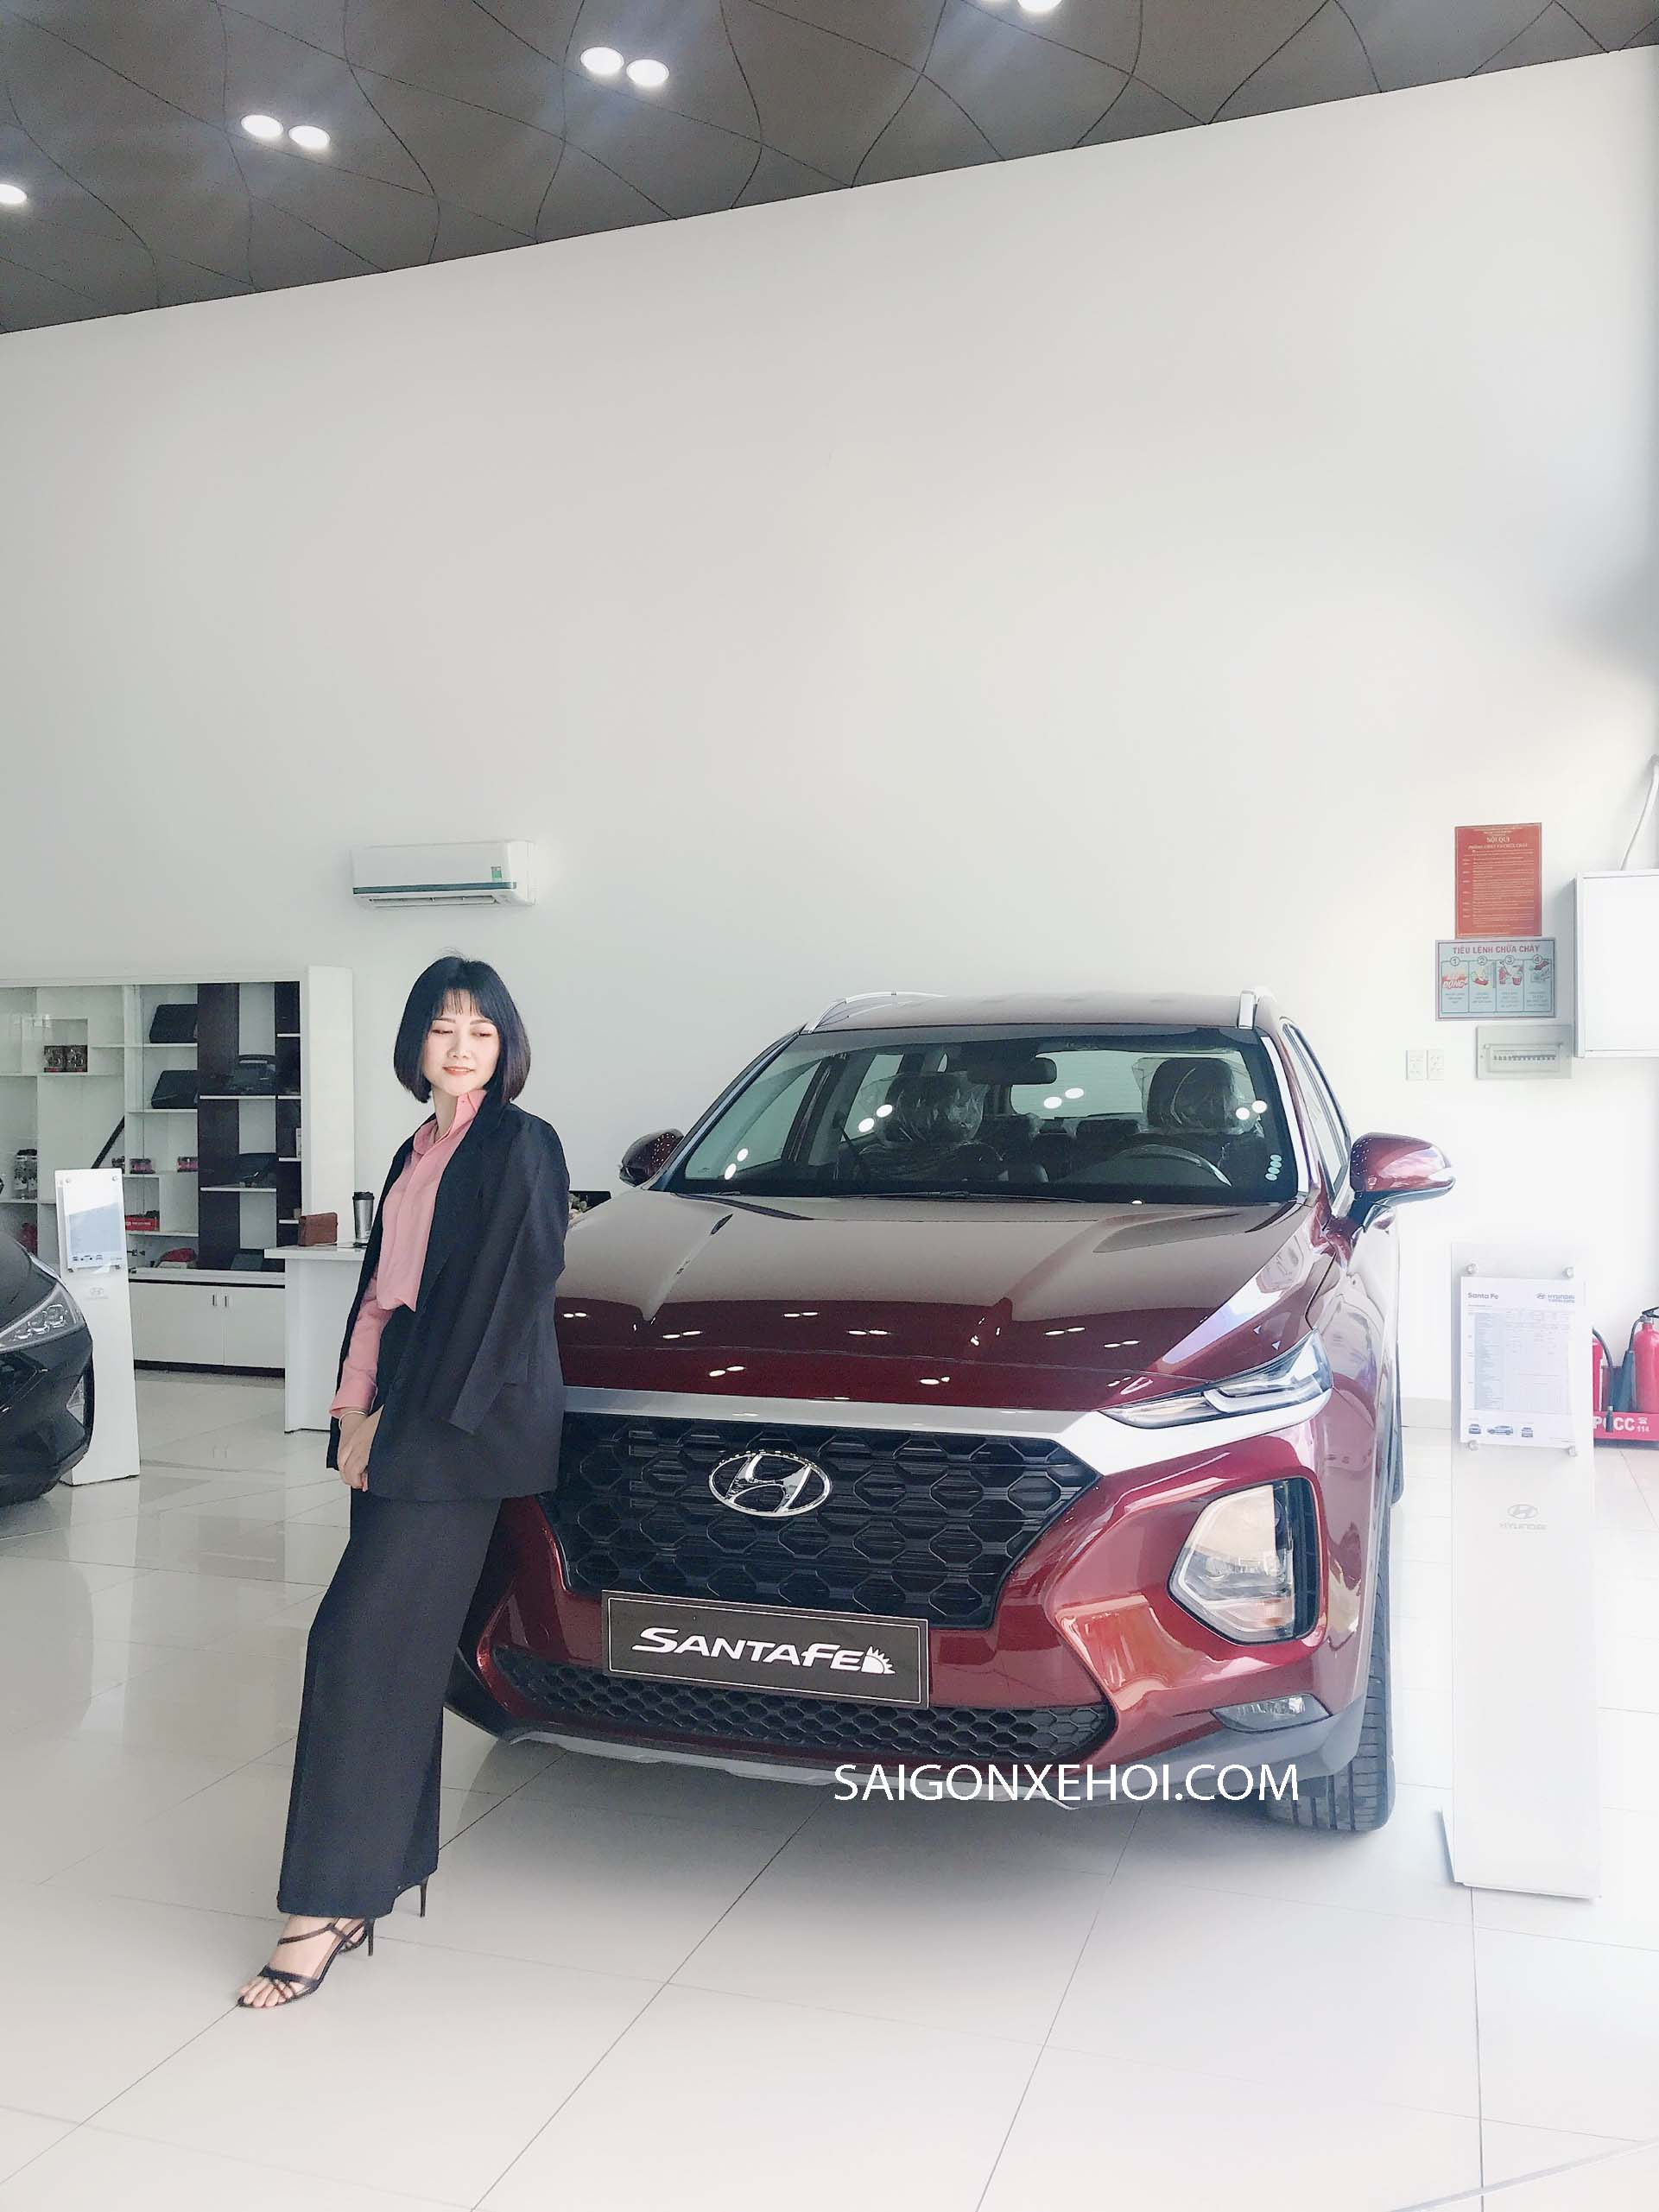 Đánh giá xe Hyundai Santafe 2020